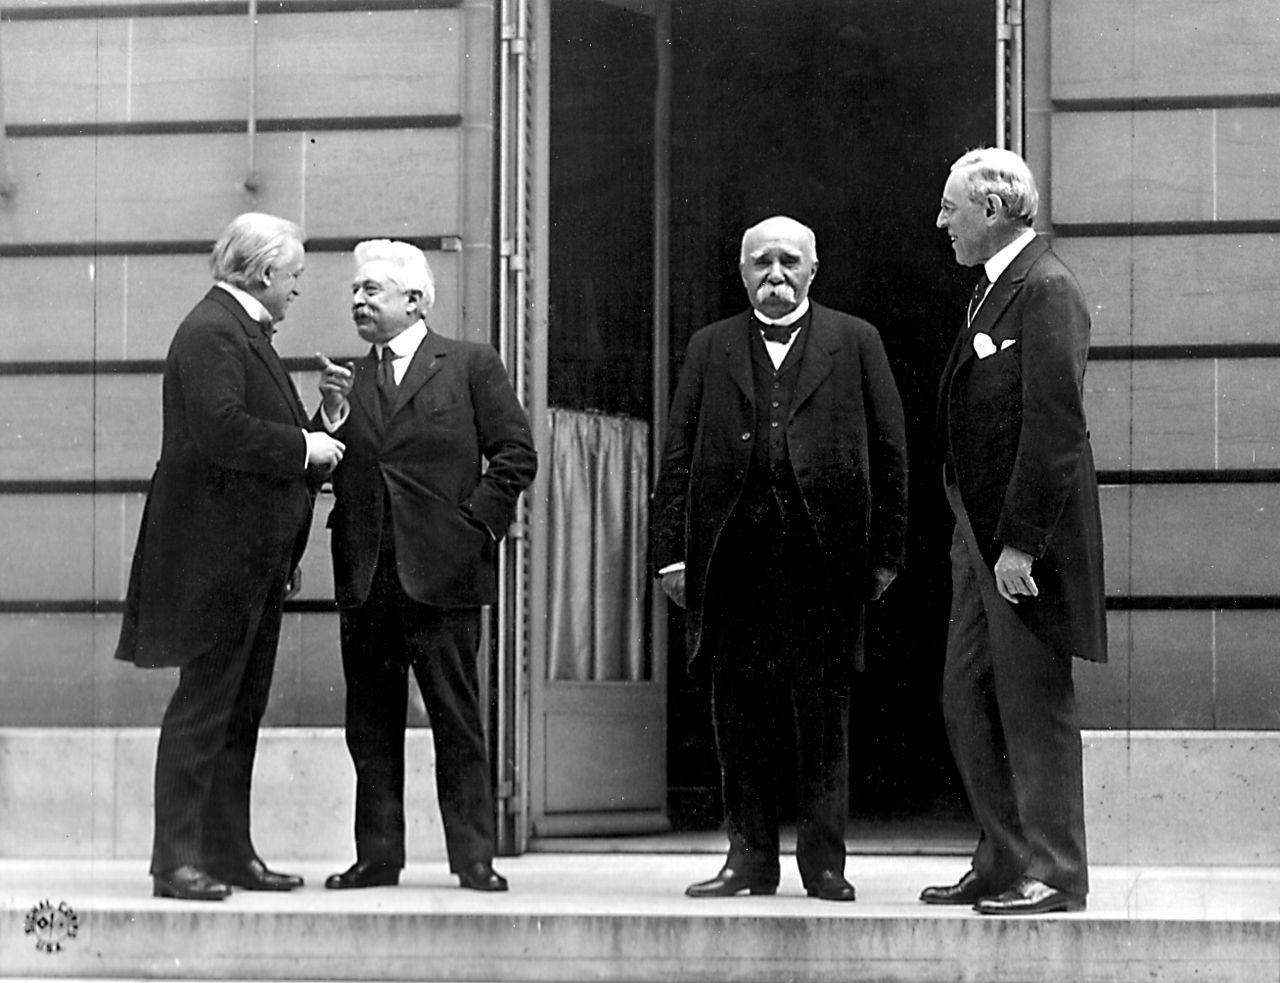 Veliki štirje na Pariški mirovni konferenci (z leve proti desni): Da-vid Lloyd George, Vittorio Emanuele Orlando, Georges Clemenceau, Woodrow Wilson. Foto: commons.wikimedia.org